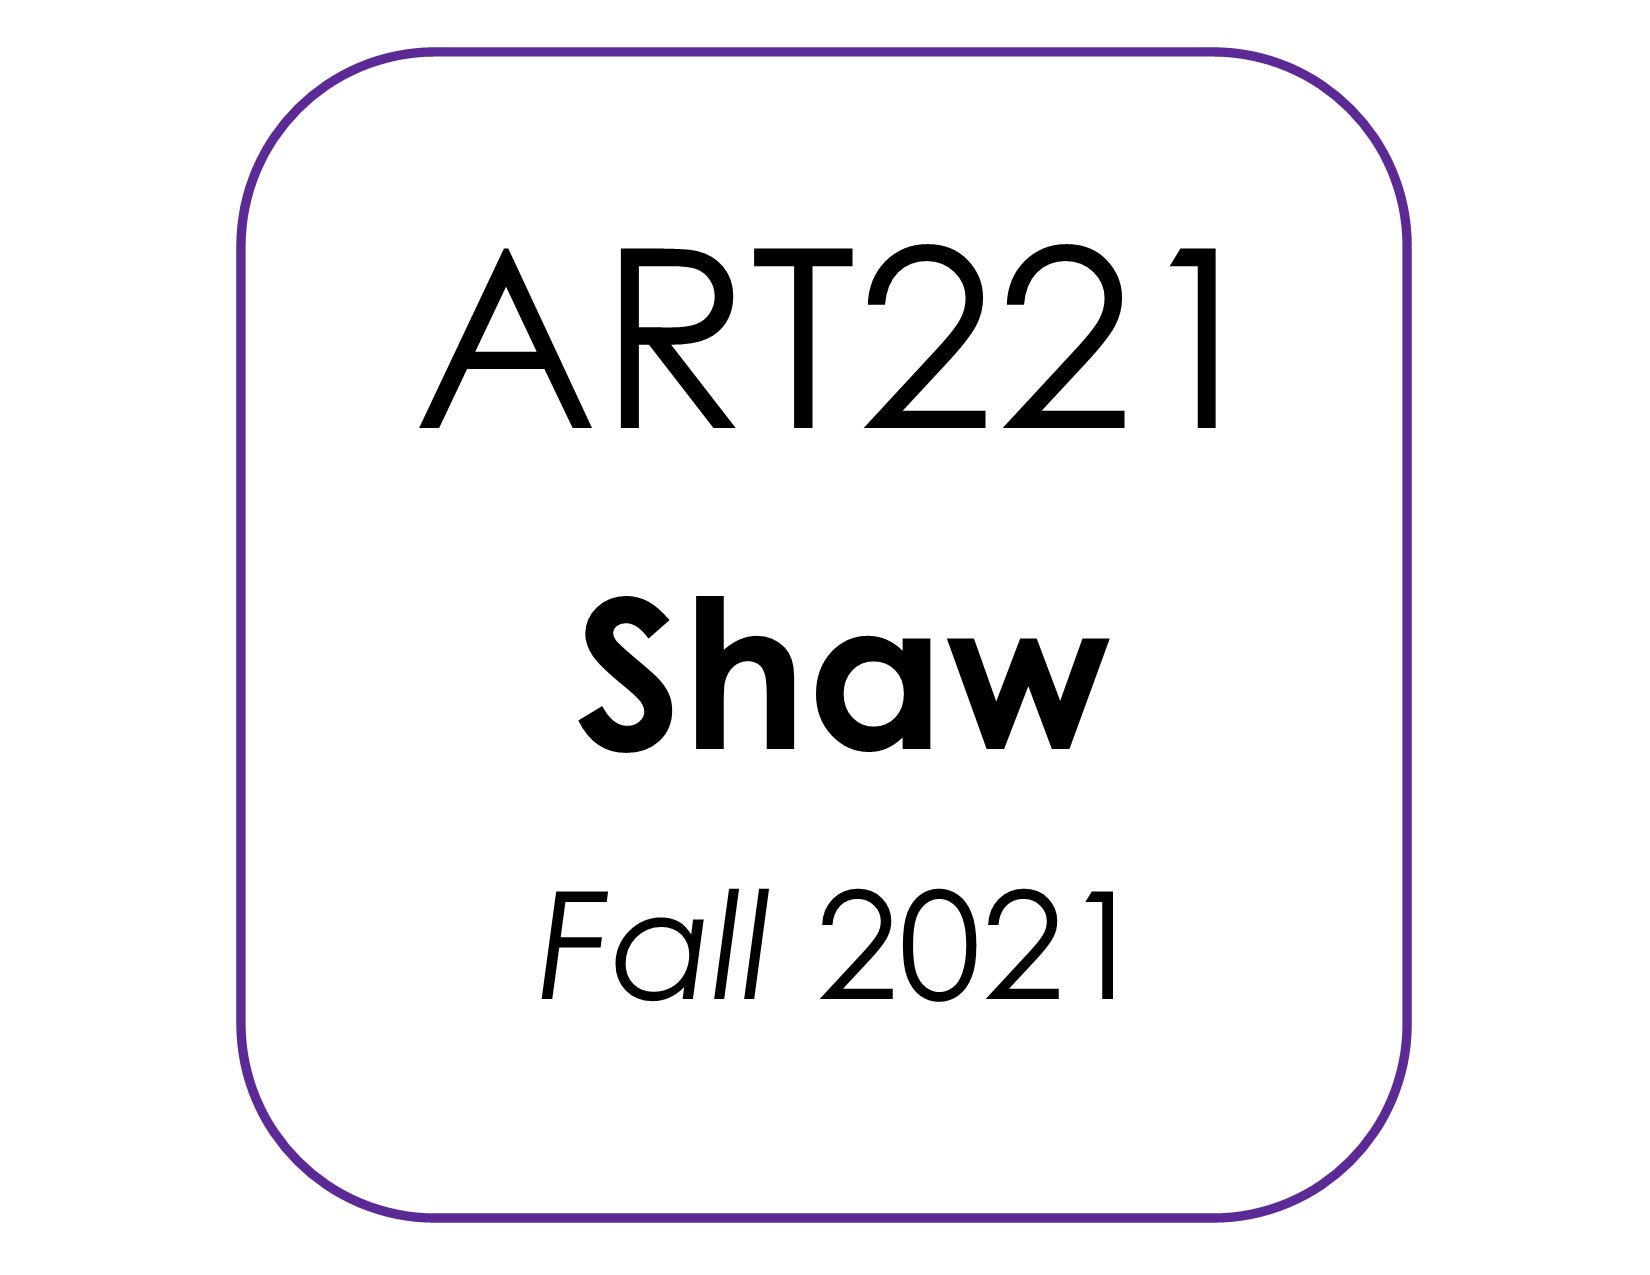 Art221 Shaw kit image F2021